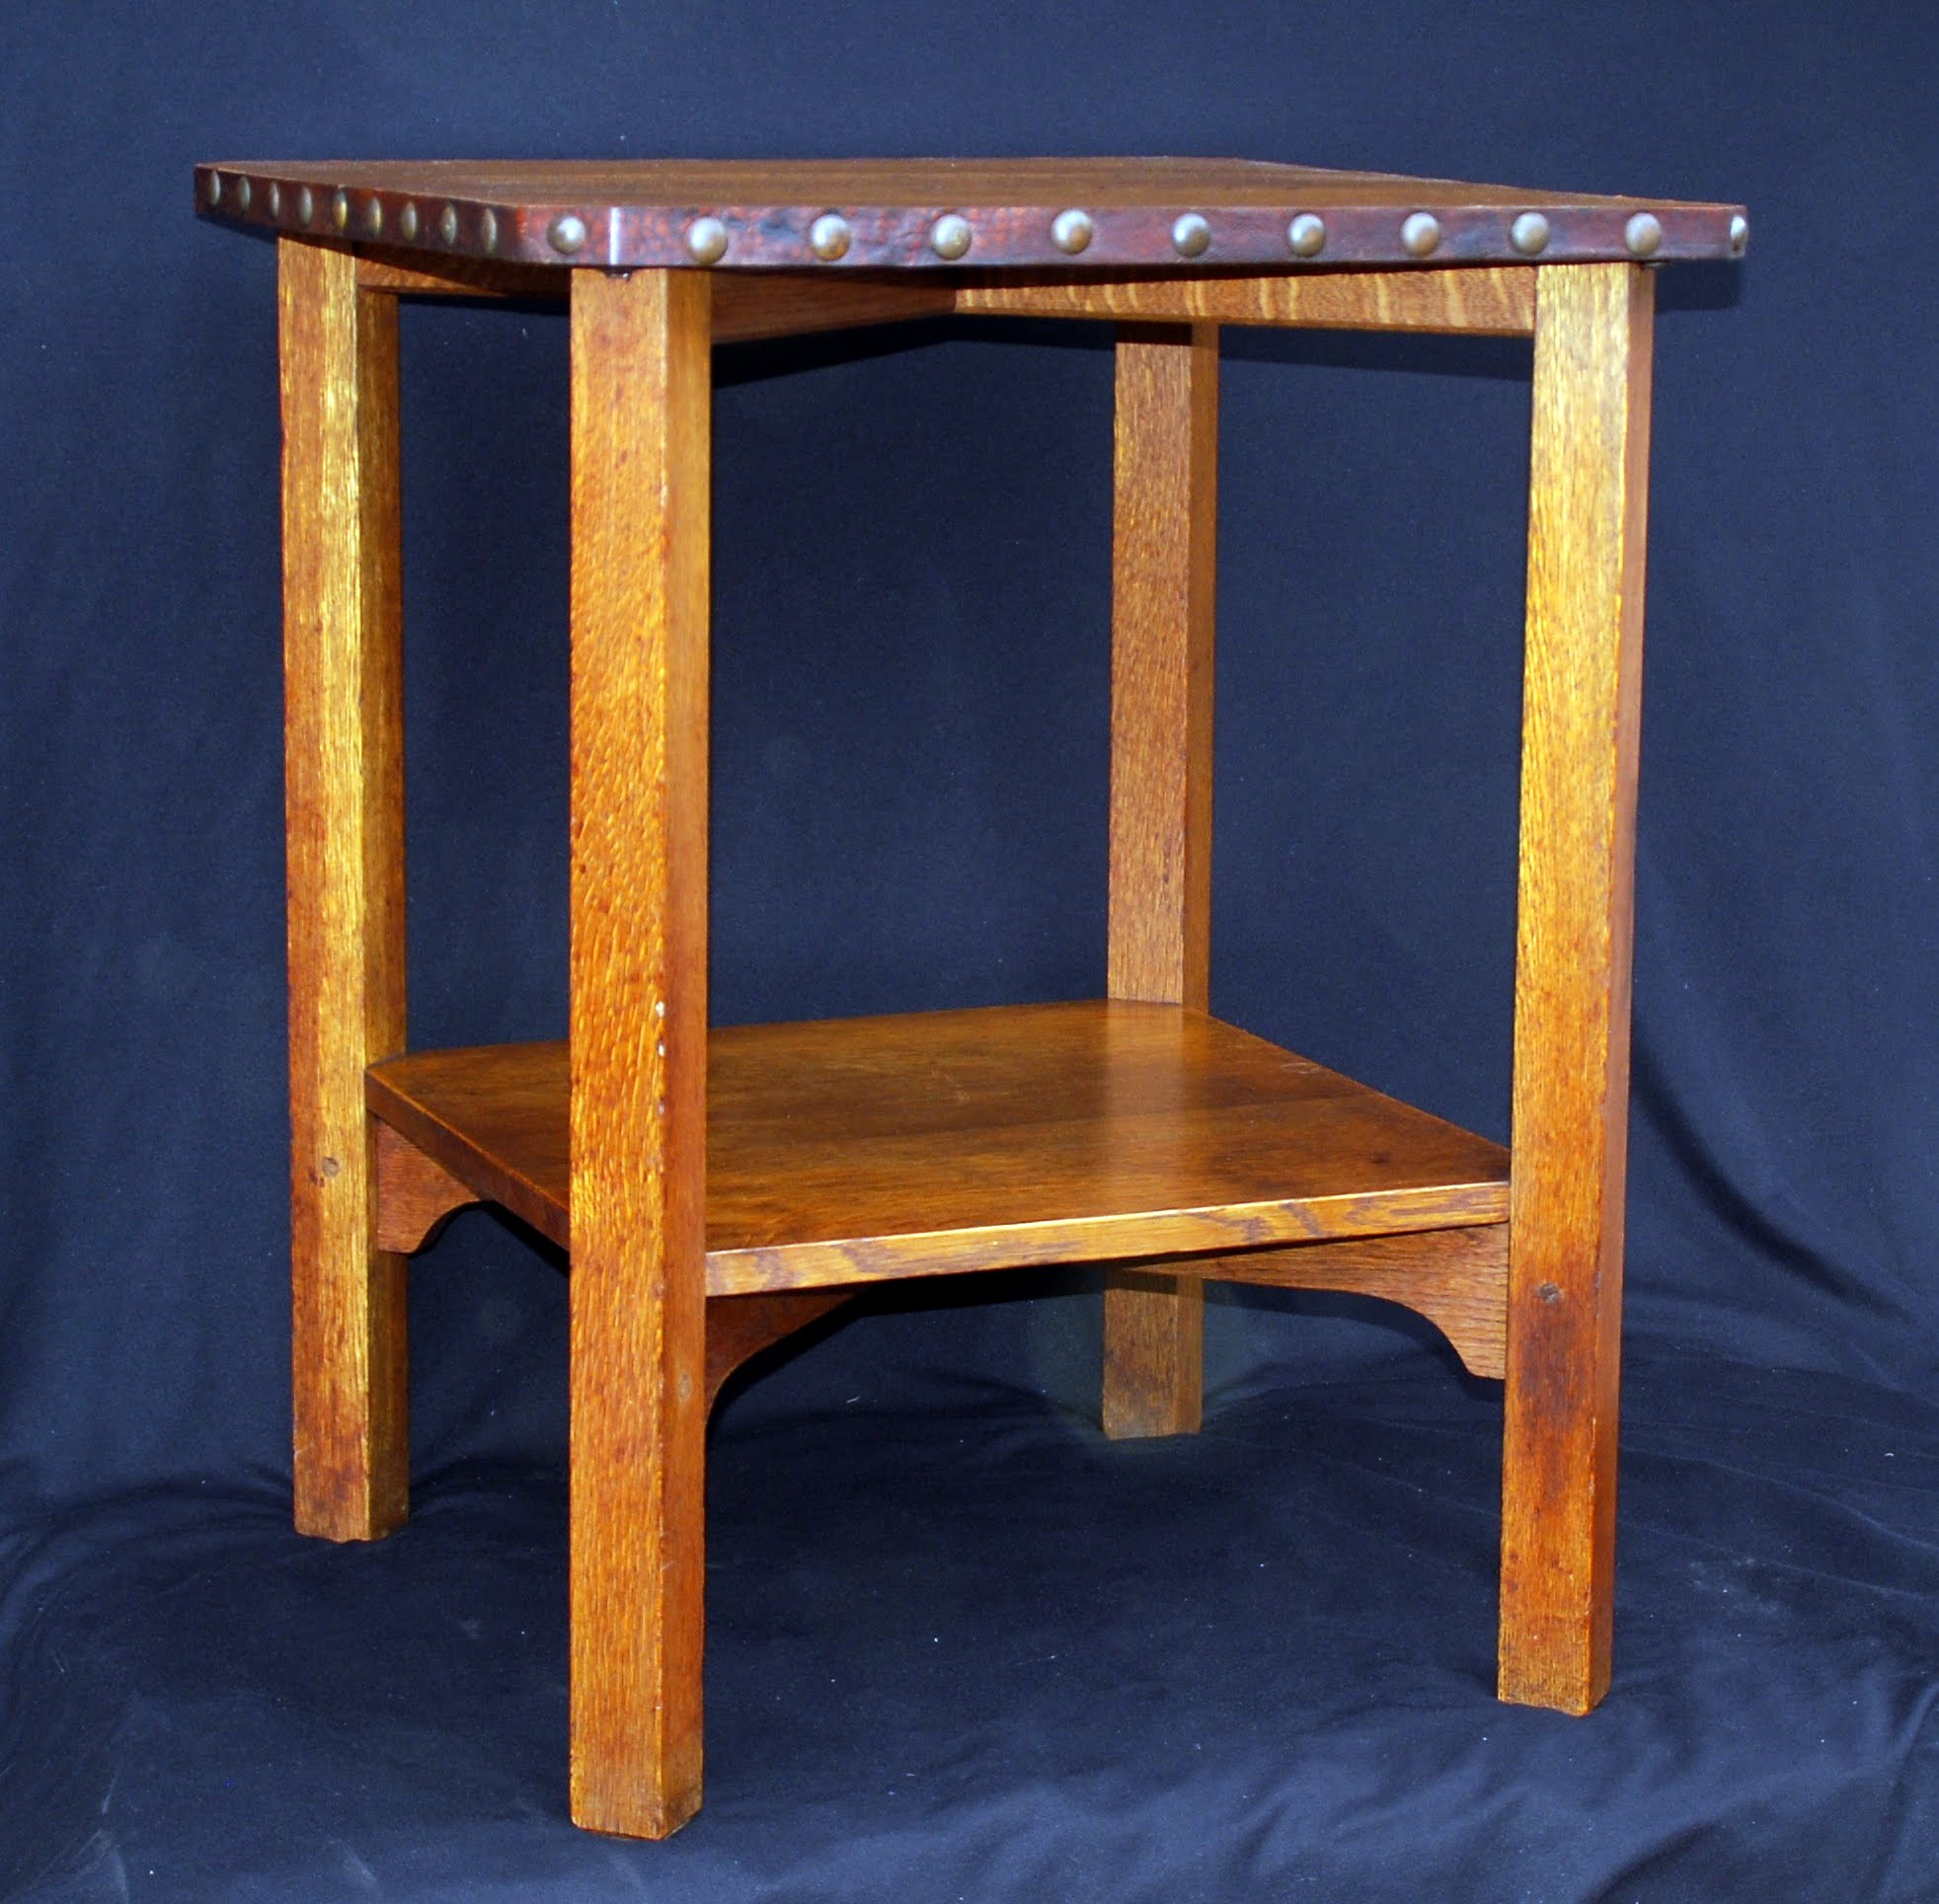 Voorhees craftsman mission oak furniture gustav stickley clip gustav stickley clip corner lamp table in excellent original finish original tacks signed aloadofball Choice Image